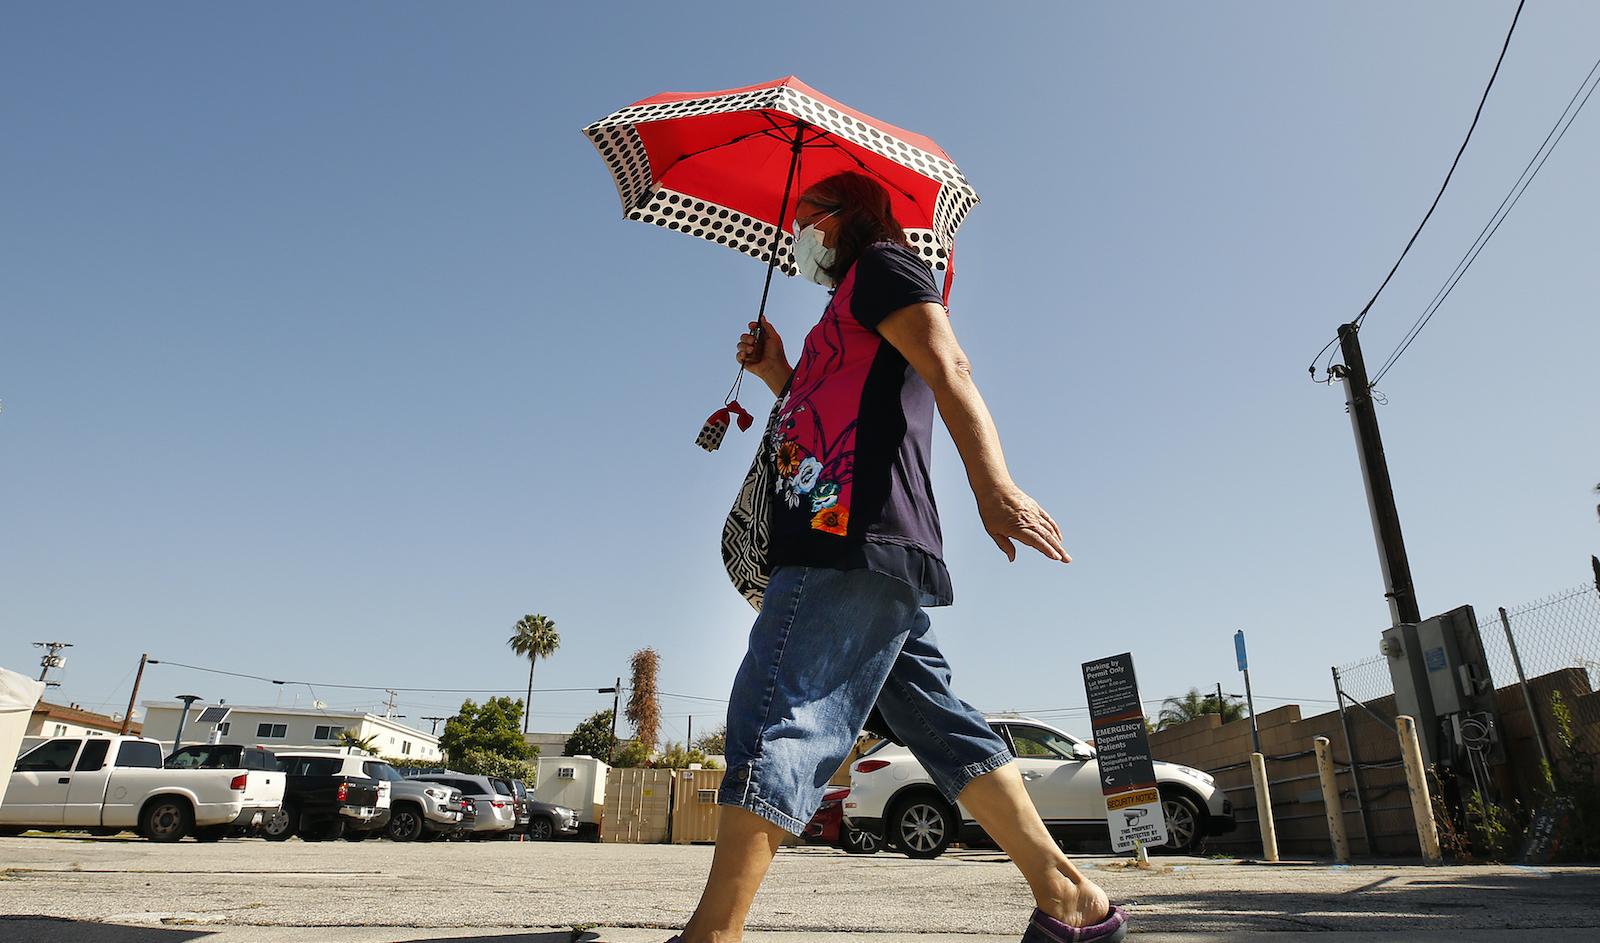 umbrella to hide form the sun in Glendale